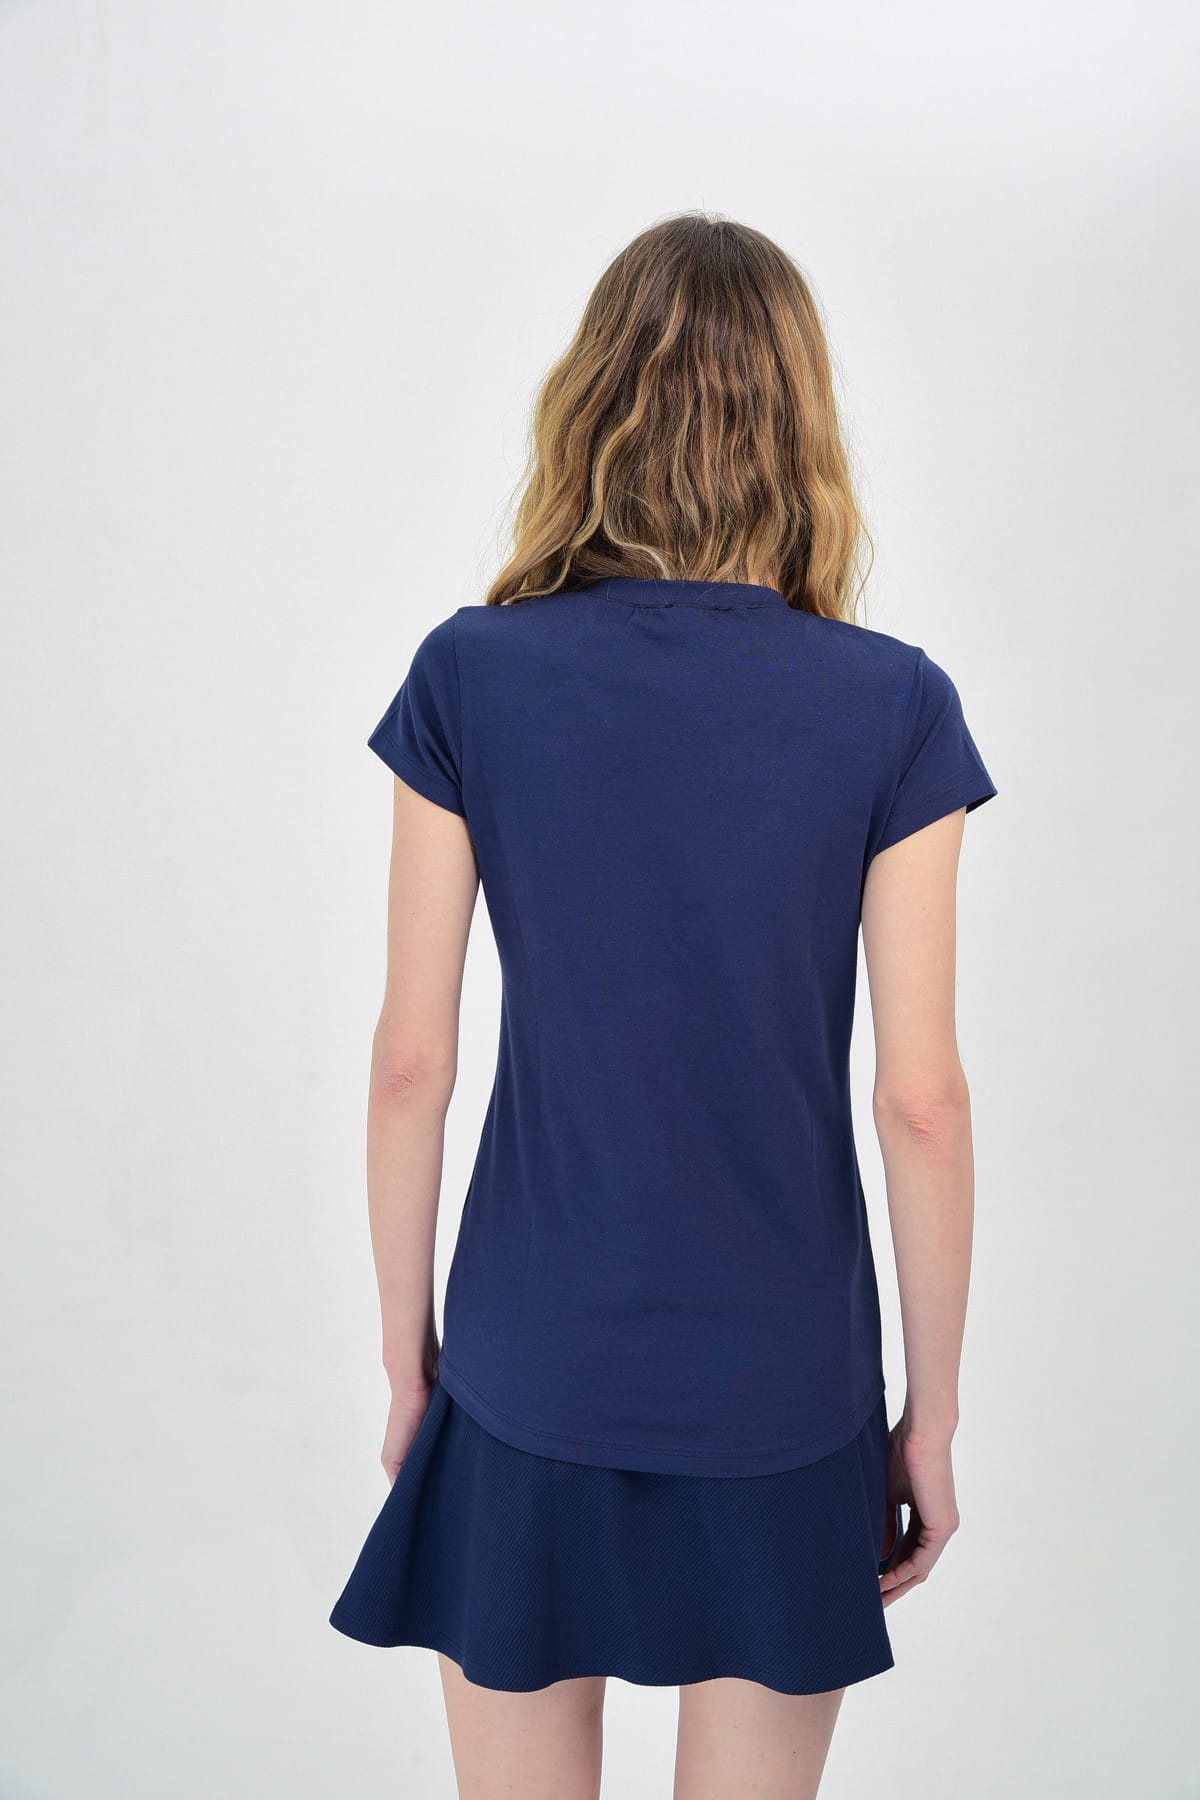 Hanna's by Hanna Darsa Kadın Lacivert Bisiklet Baskılı T-Shirt Hn1308 2